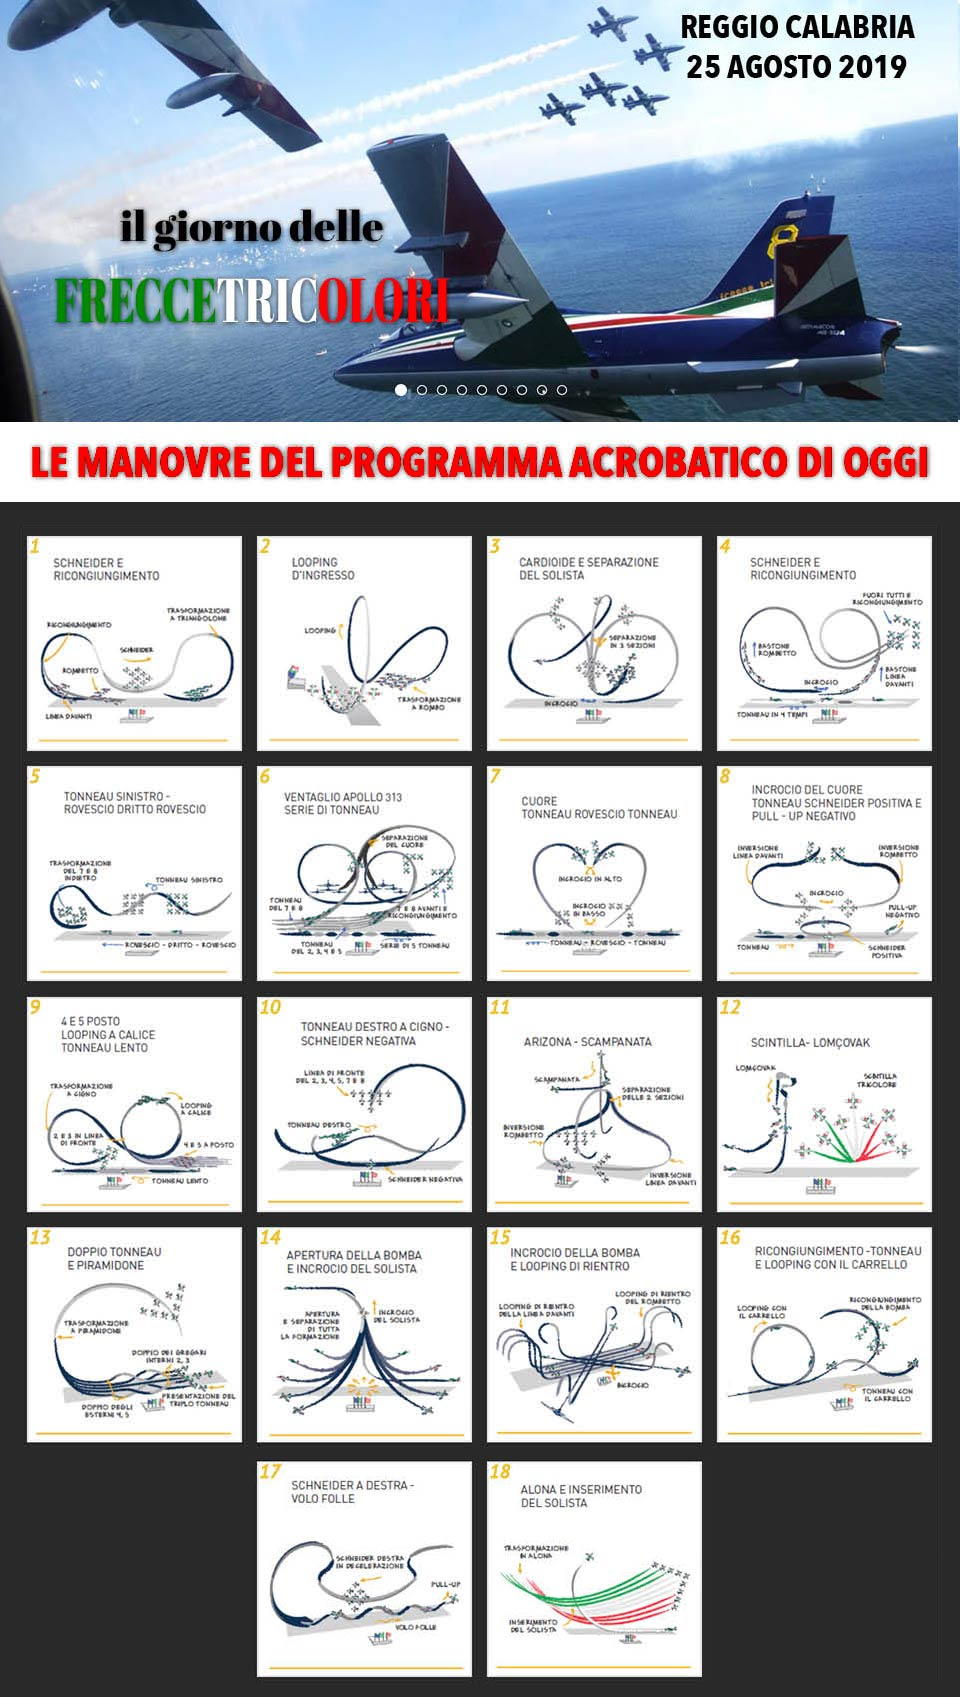 AirShow 2019 a Reggio